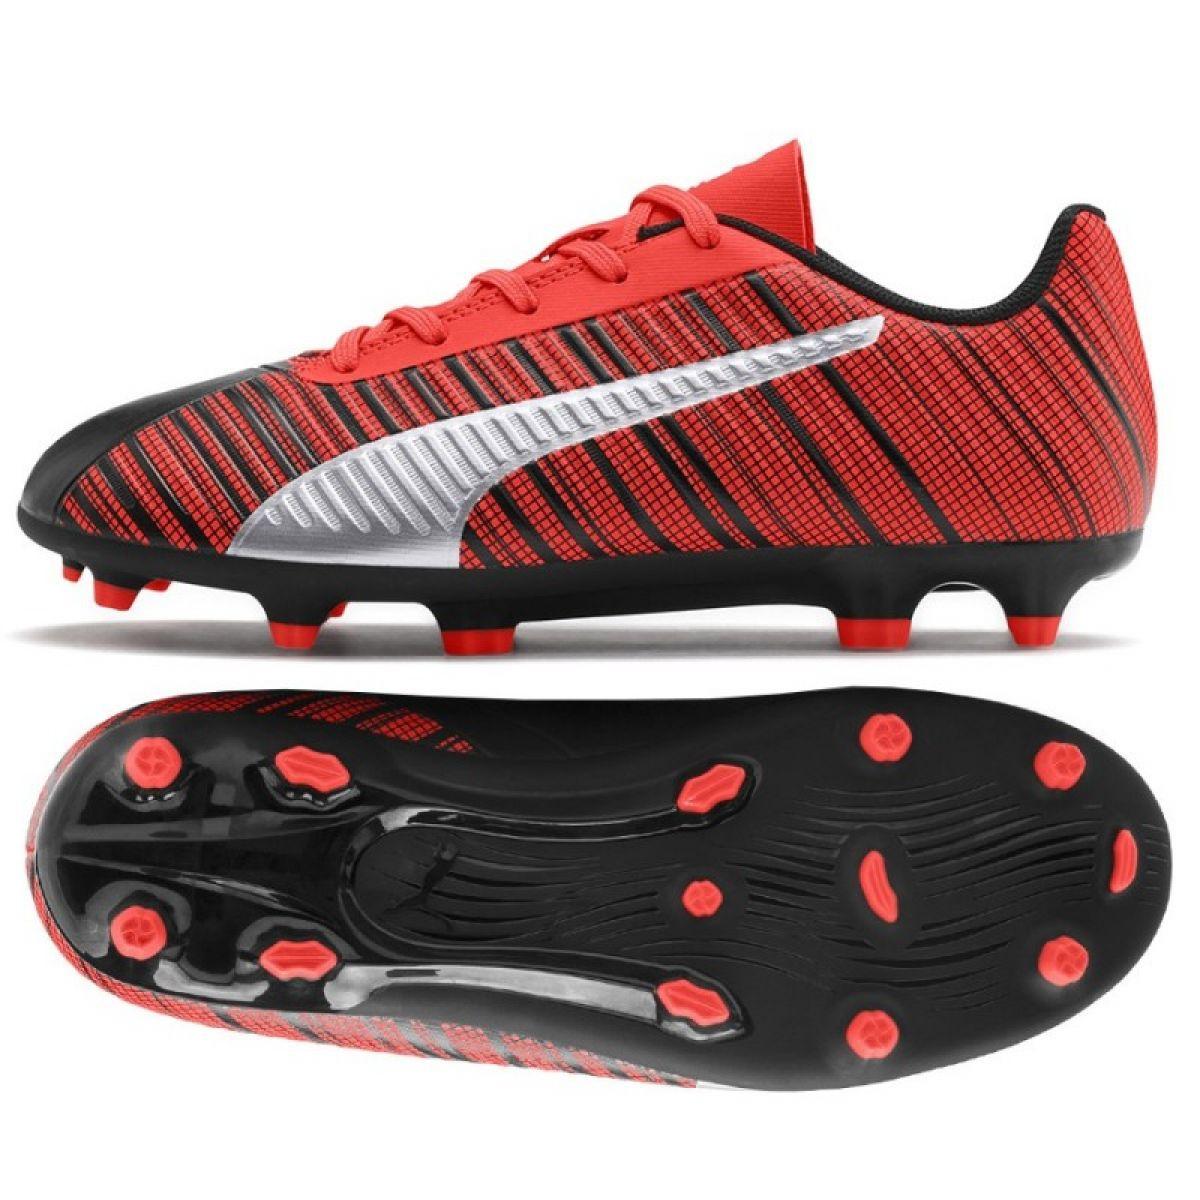 best cheap 9a3e0 70ed6 Puma One 5.4 Fg Ag M 105660 01 scarpe rosse